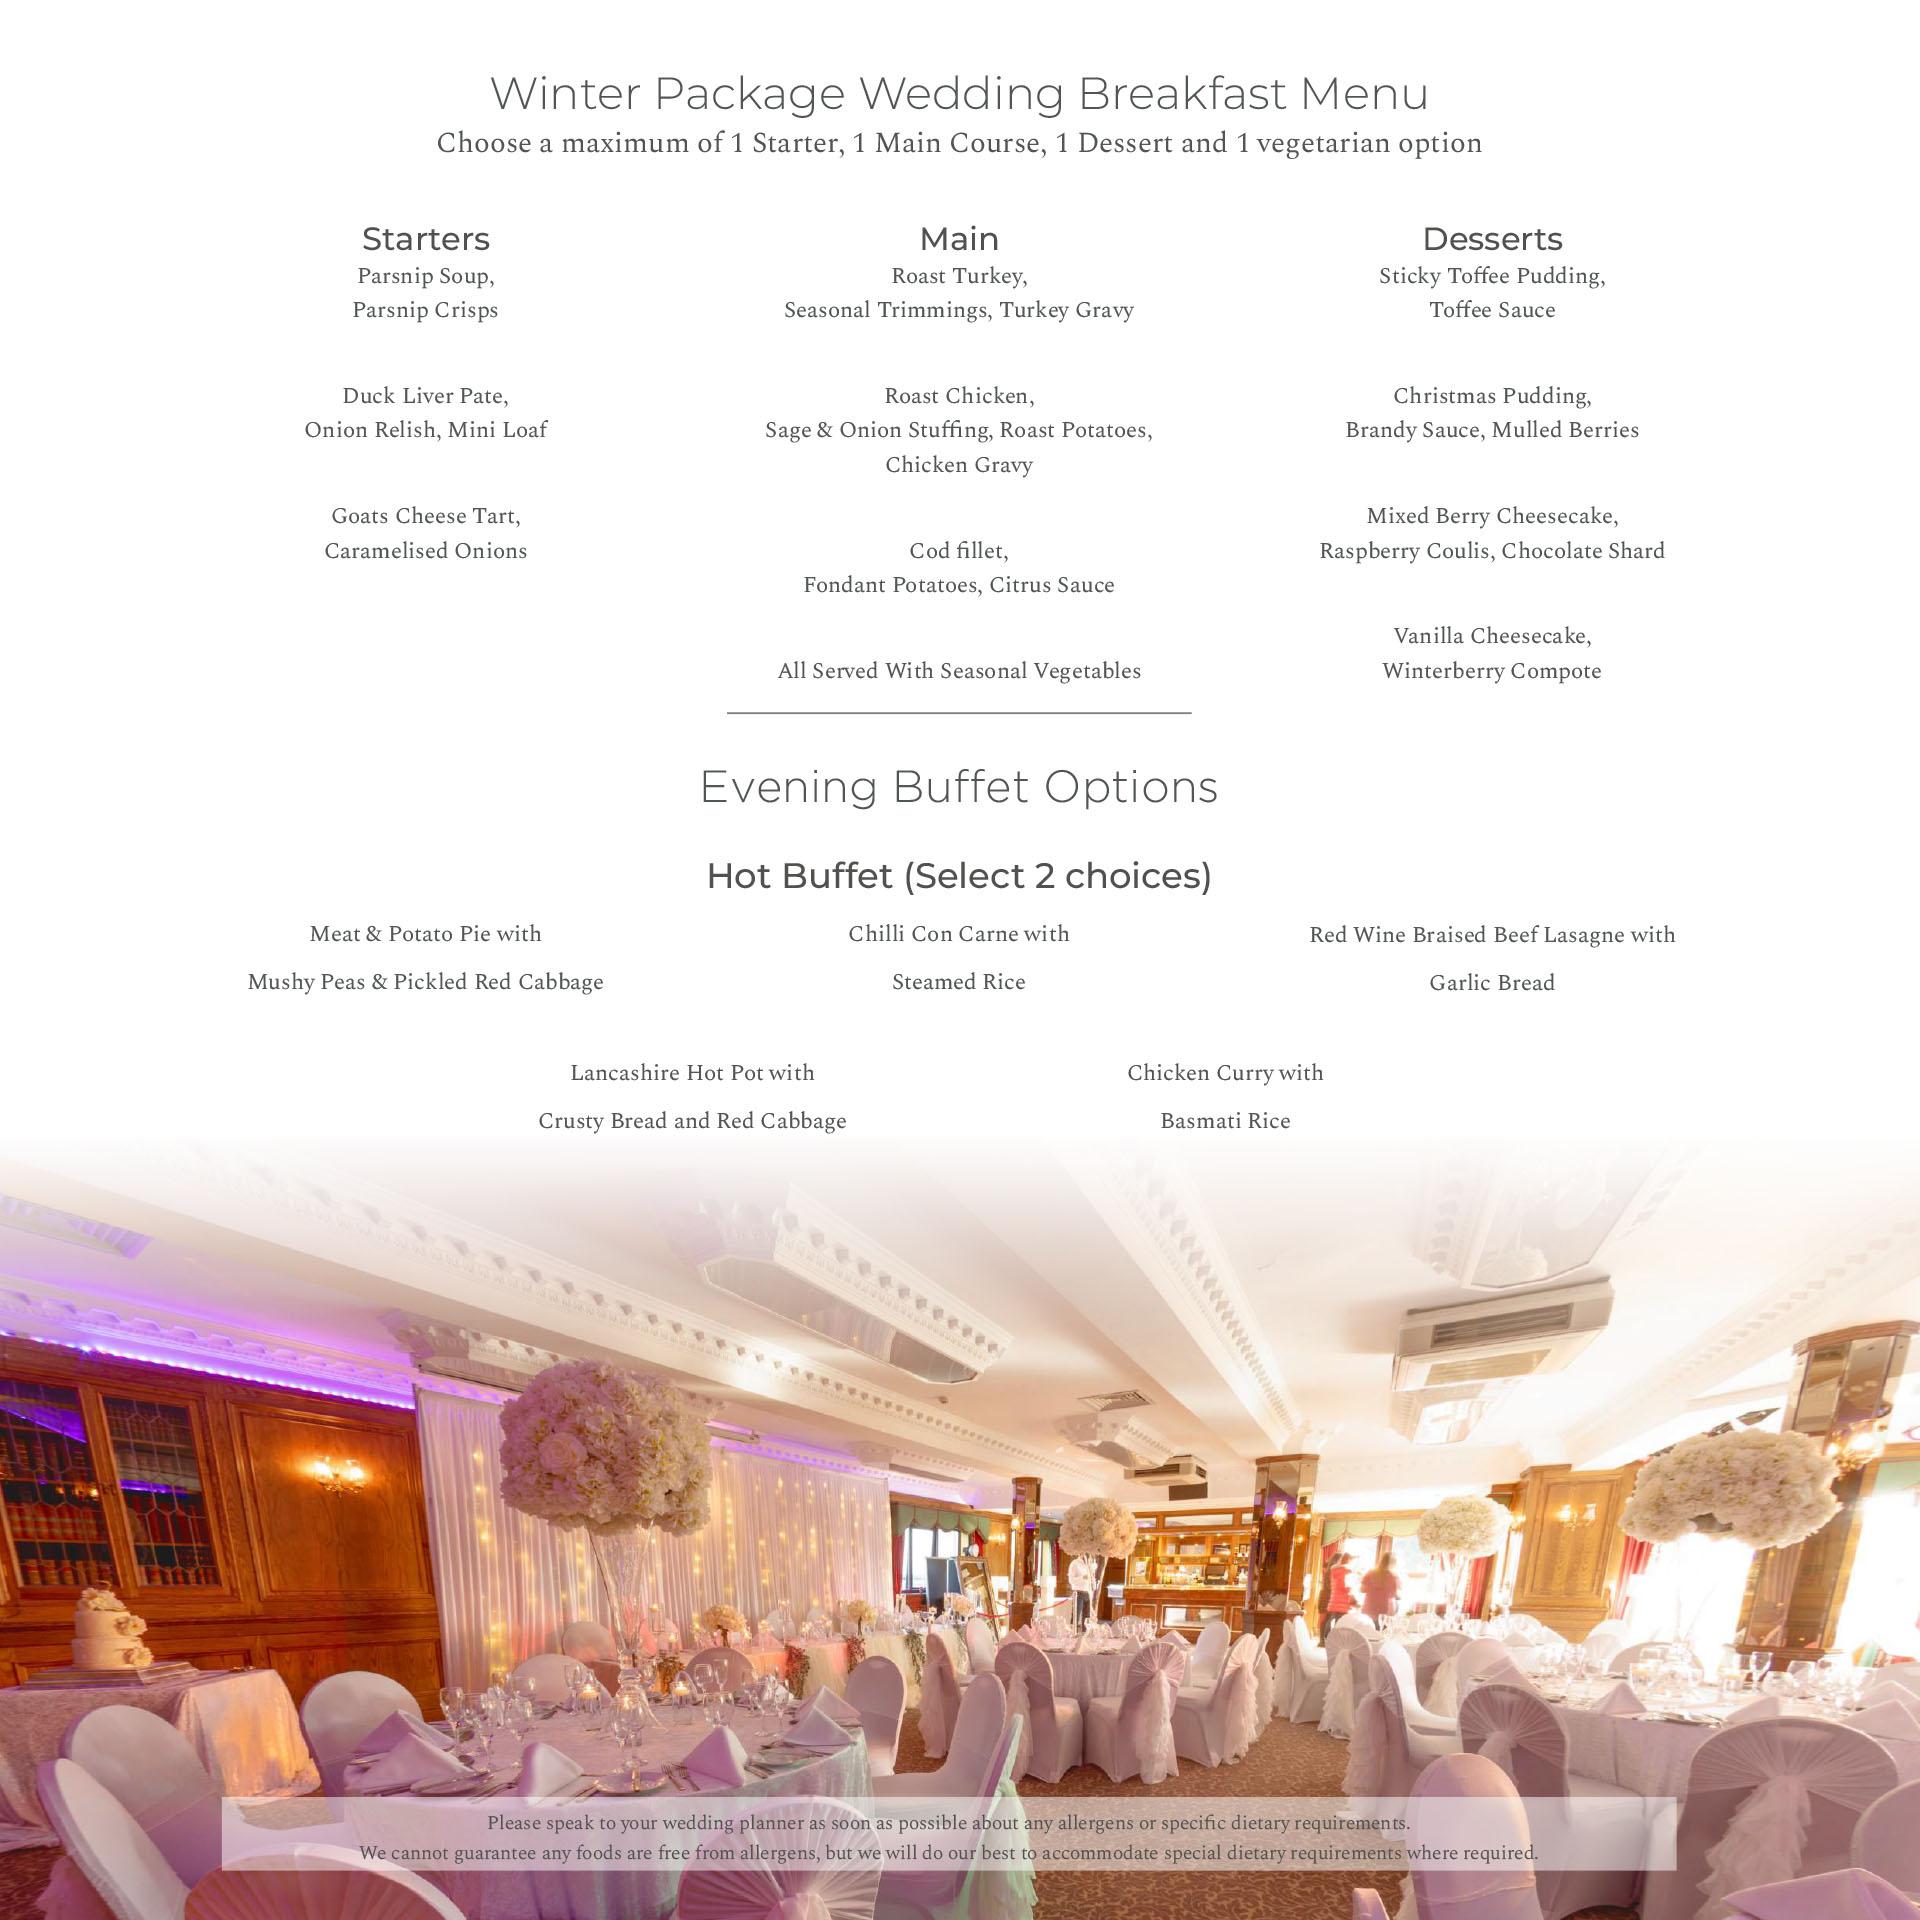 Winter Wedding Package at Weddings Bredbury Hall Wedding Venue in Stockport Cheshire